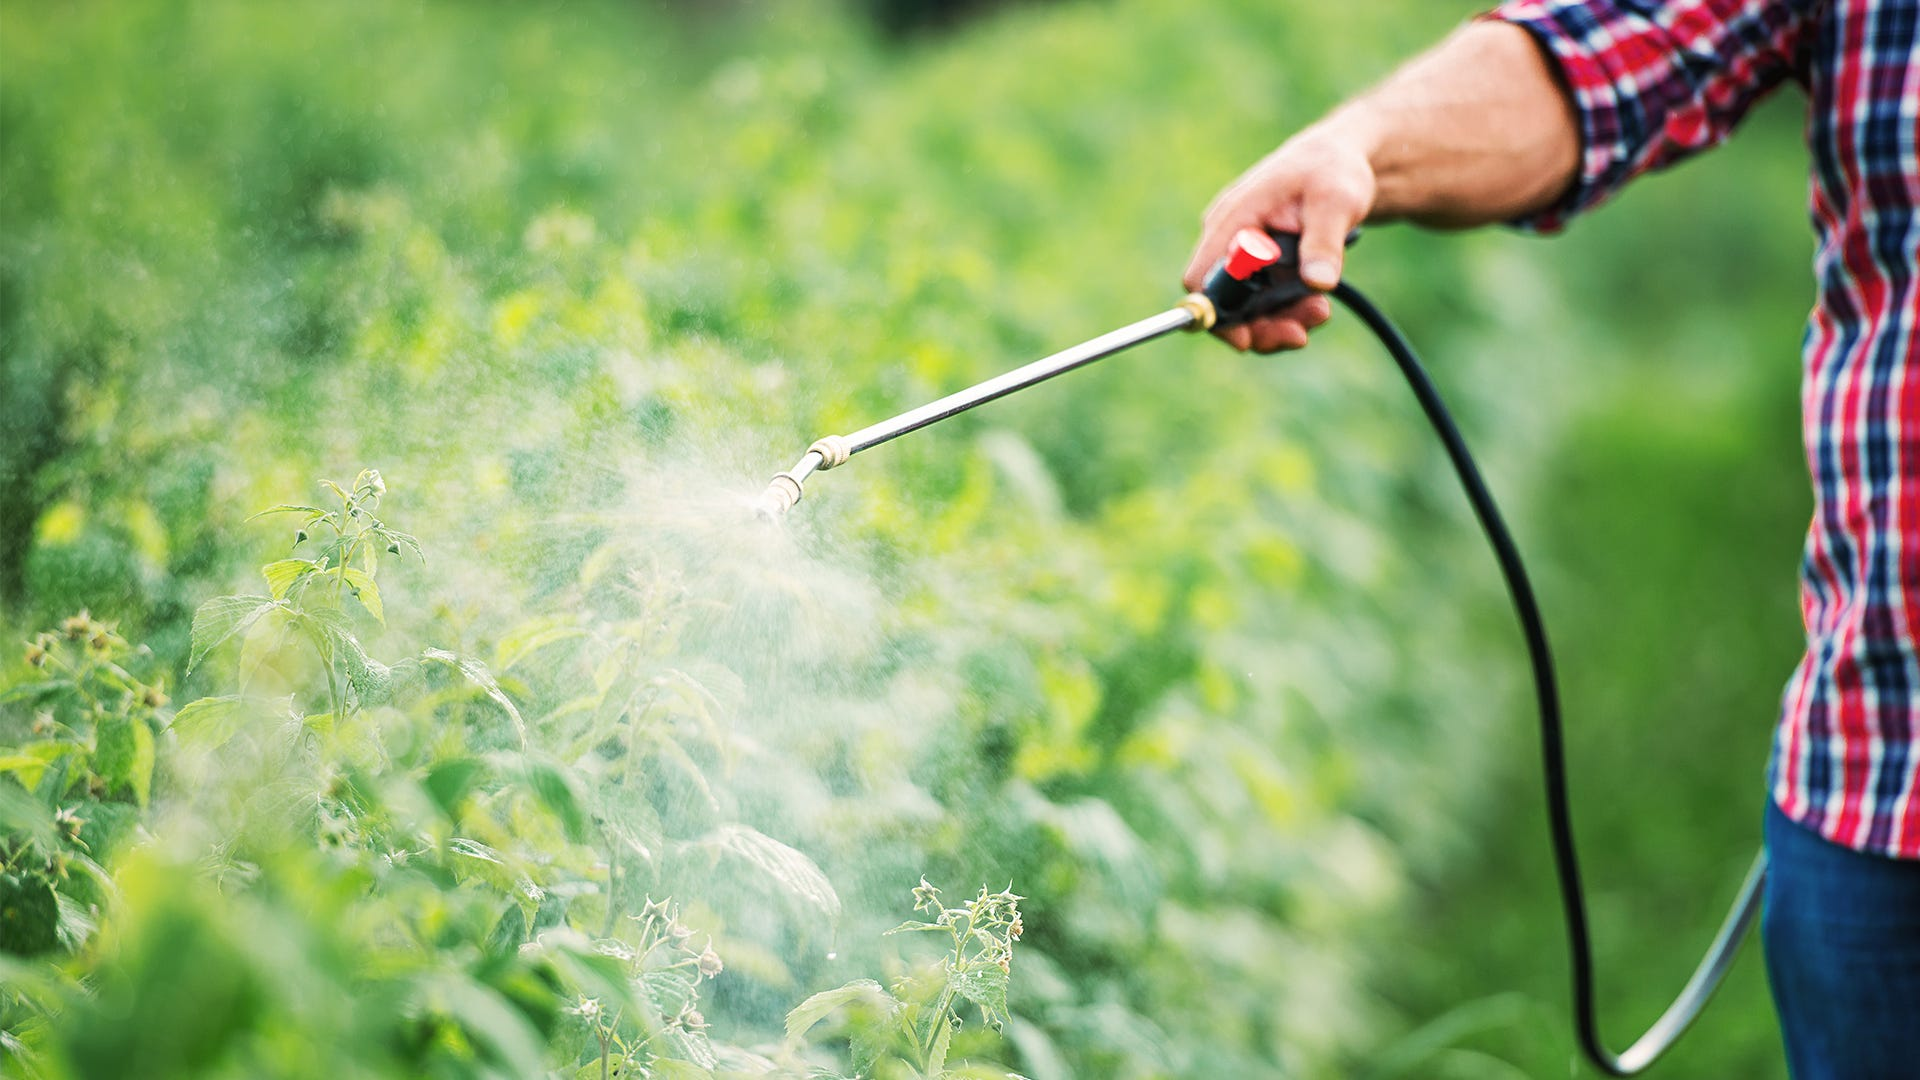 Save Our Birds: Prevent Harmful Pesticide Use